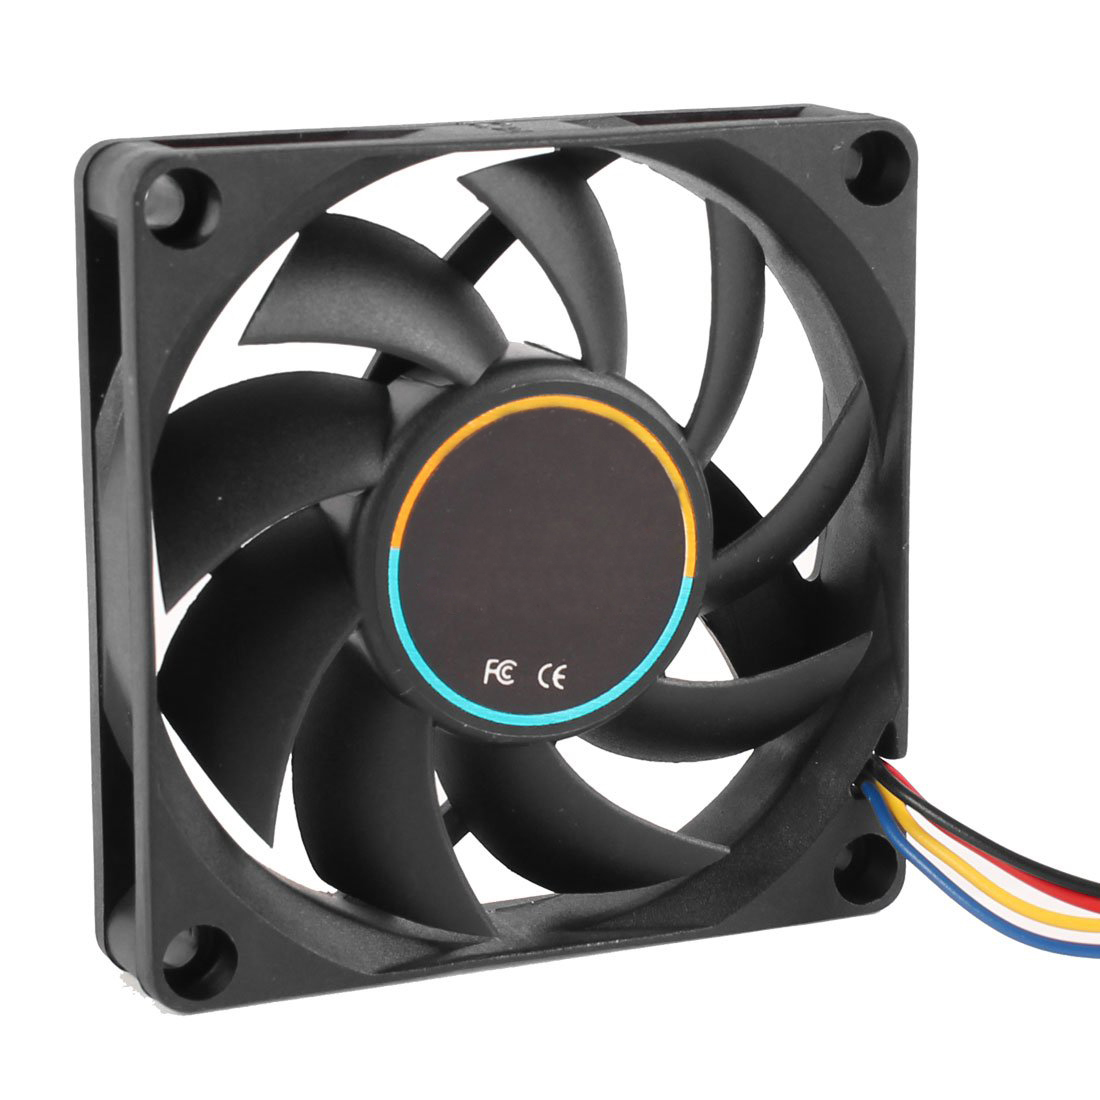 70x70x15mm 12V 4 Pins PWM PC Computer Case CPU Cooler Cooling Fan Black